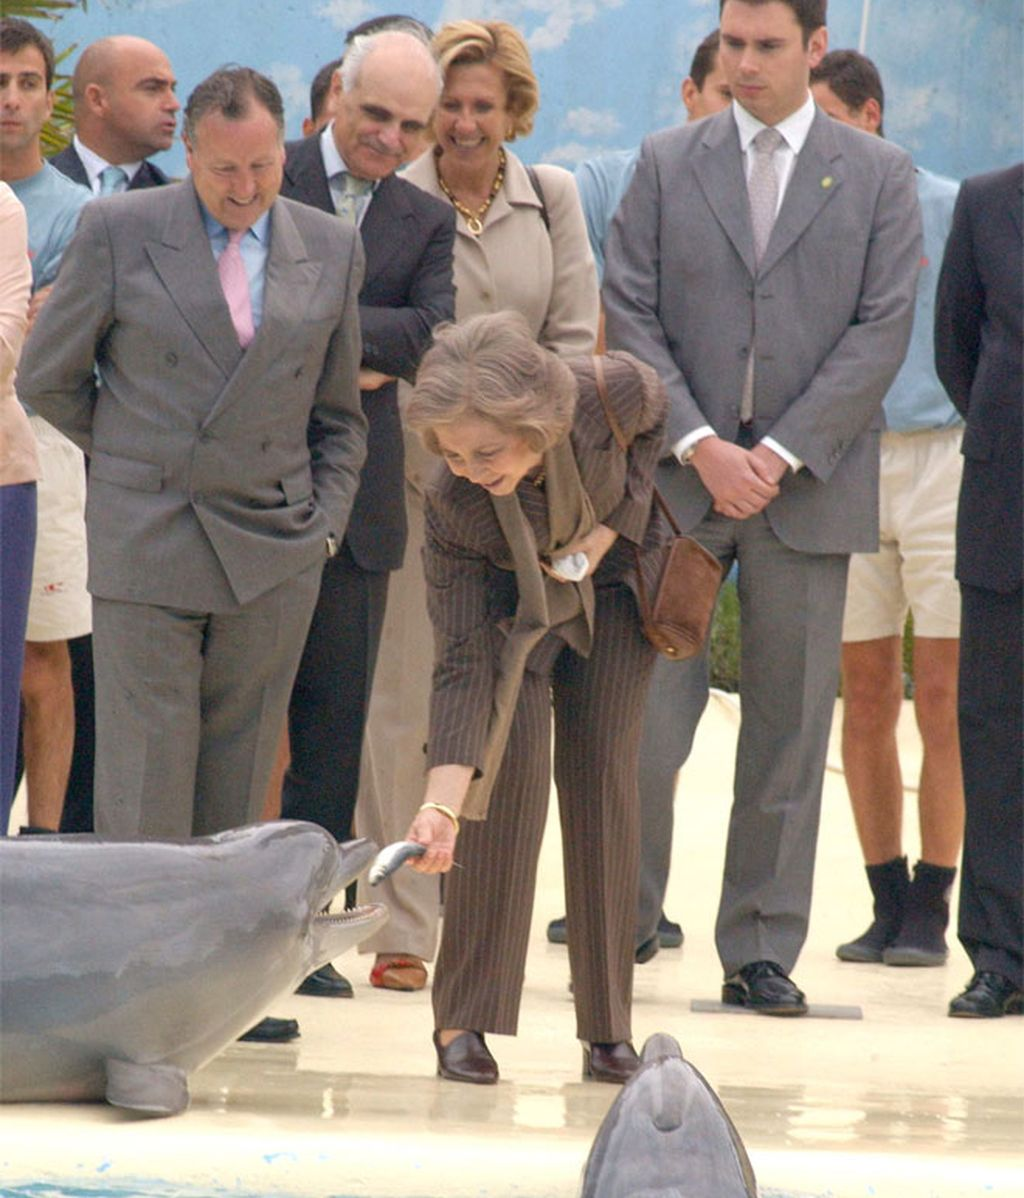 La pasión animal de la Reina Sofía